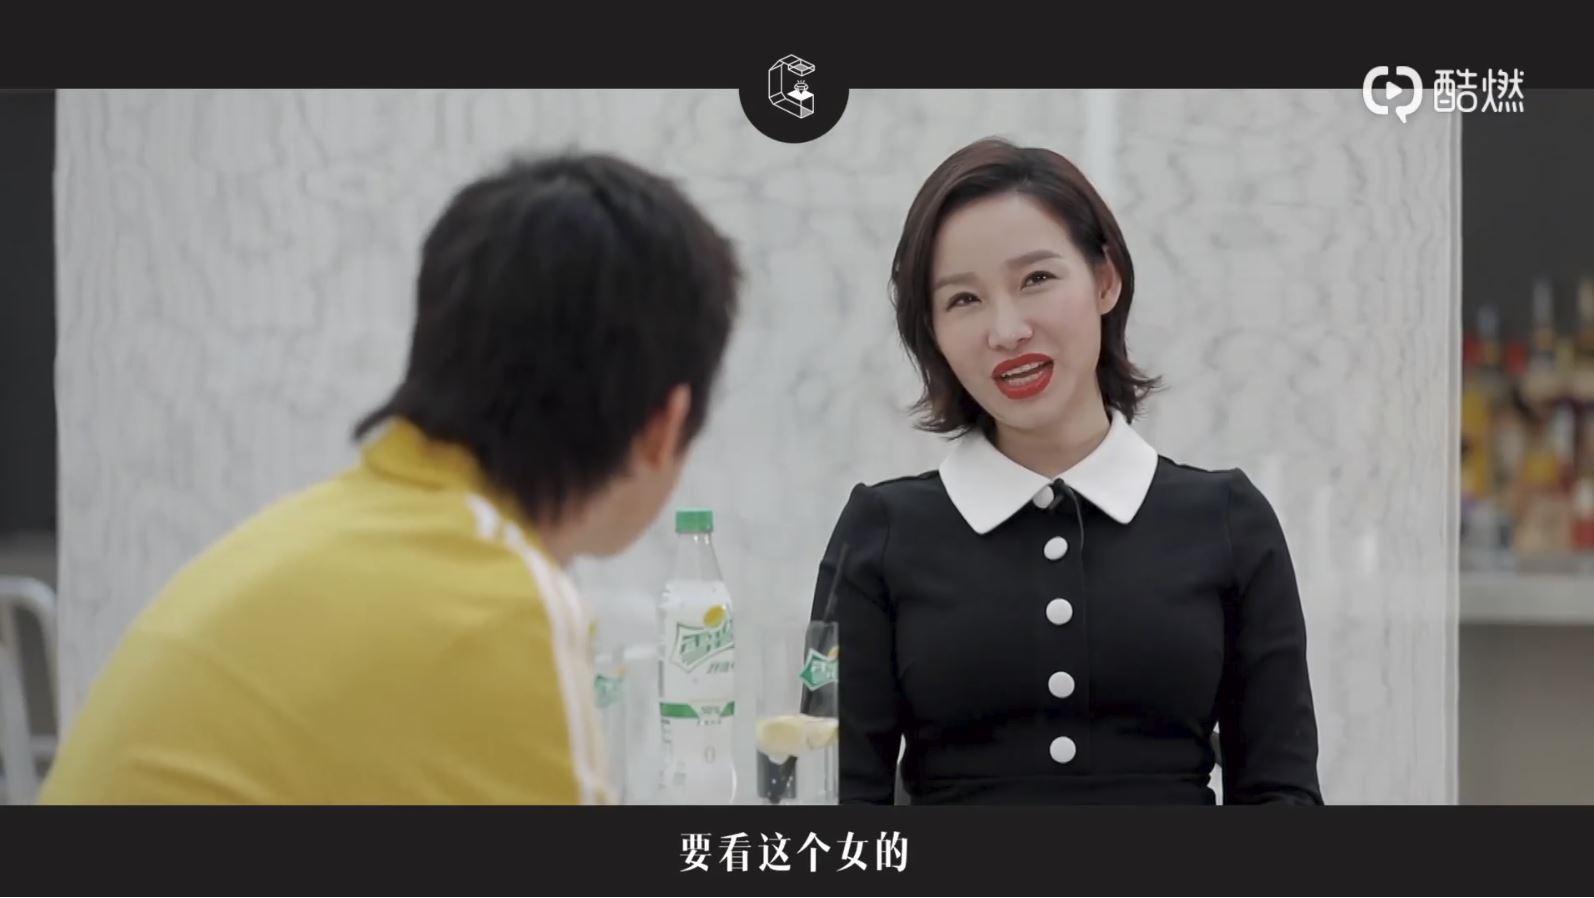 【CDTV】对话 @Ayawawa:未来50年女权占不了主流